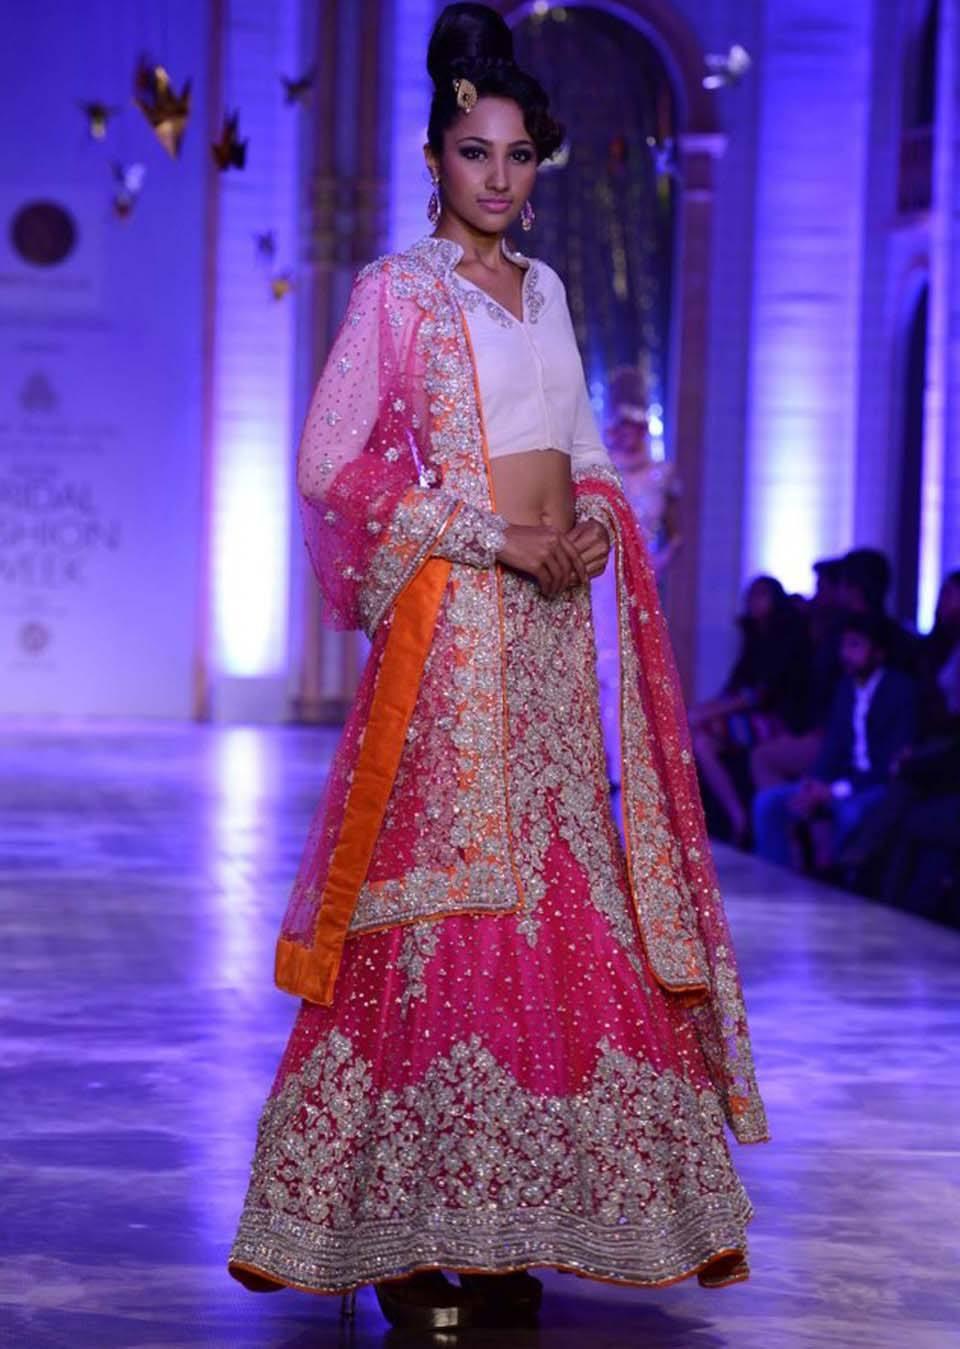 Latest-Indian-Designers-Barat-Dresses-for-Wedding-Brides-2016-2017-24 Manish Malhotra Wedding Dresses 2017-Top 20 Bridal Dress by Manish Malhotra